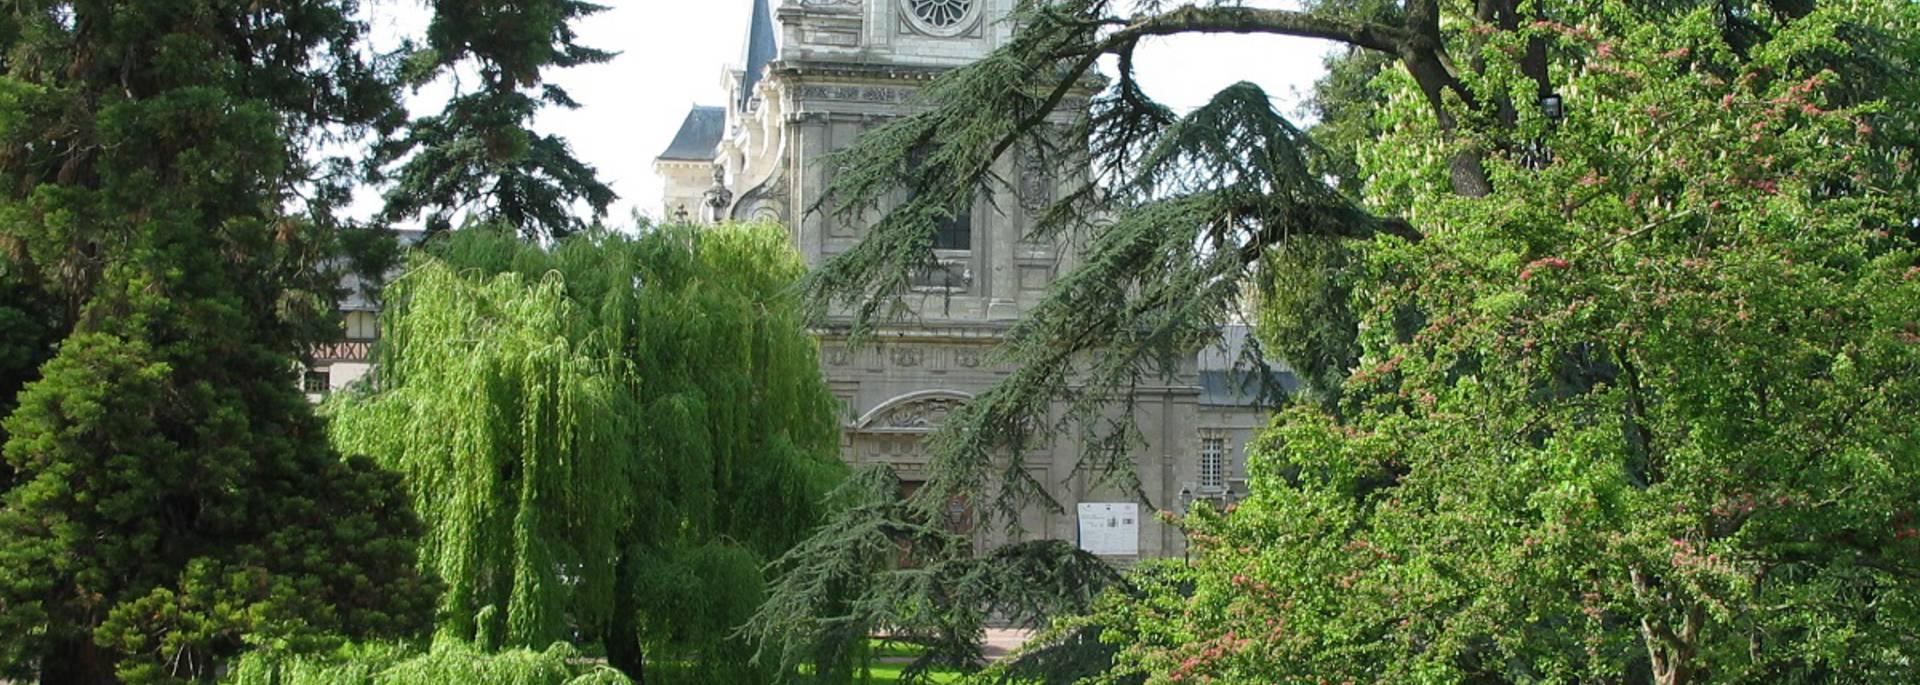 El jardín Augustin Thierry en Blois